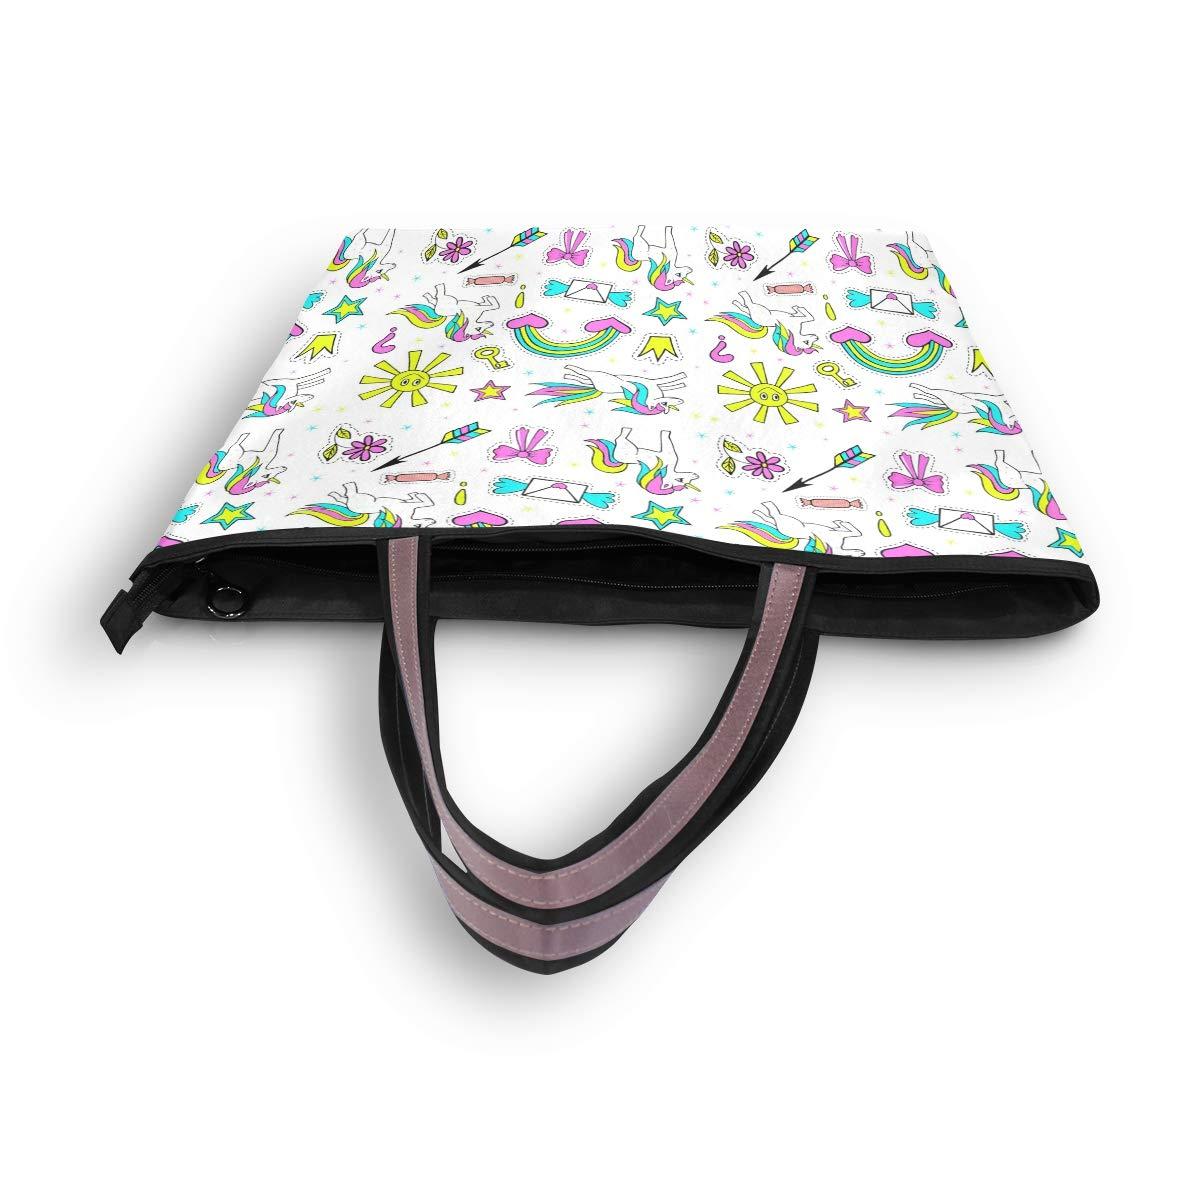 Women Handle Fashion Unicorn Sun Crown Satchel Handbags Tote Purse Shoulder Bag Big Capacity Handbag